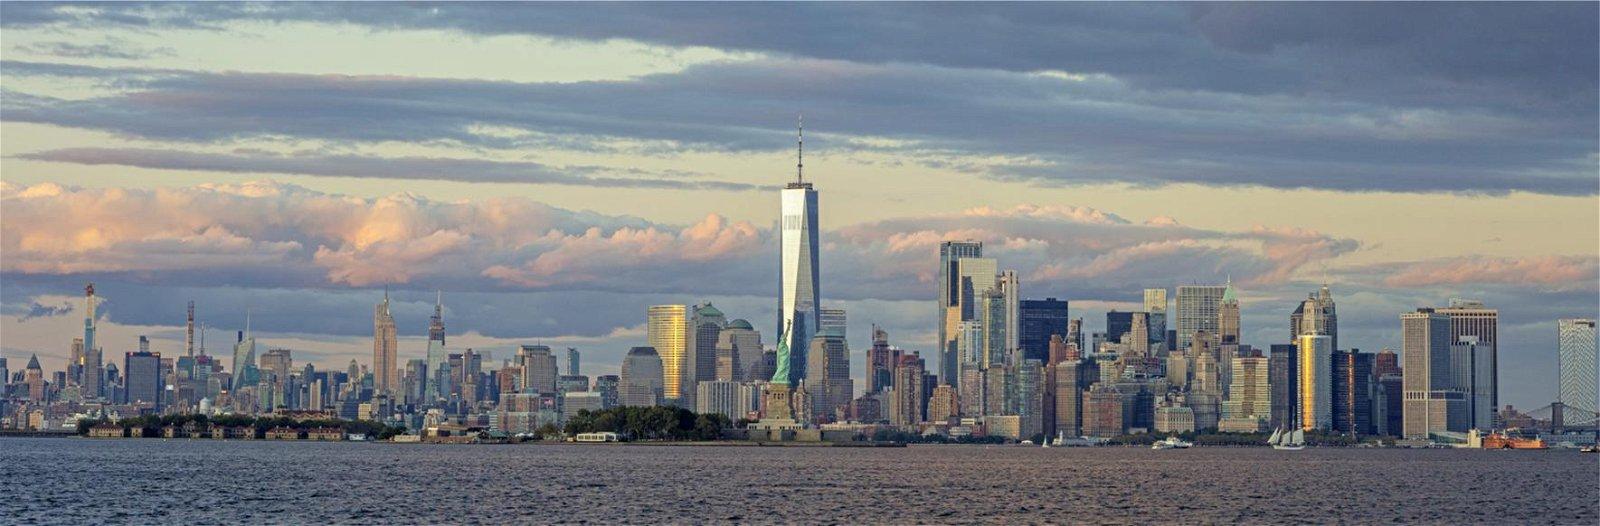 Cuadro canvas fotografia skyline manhattan